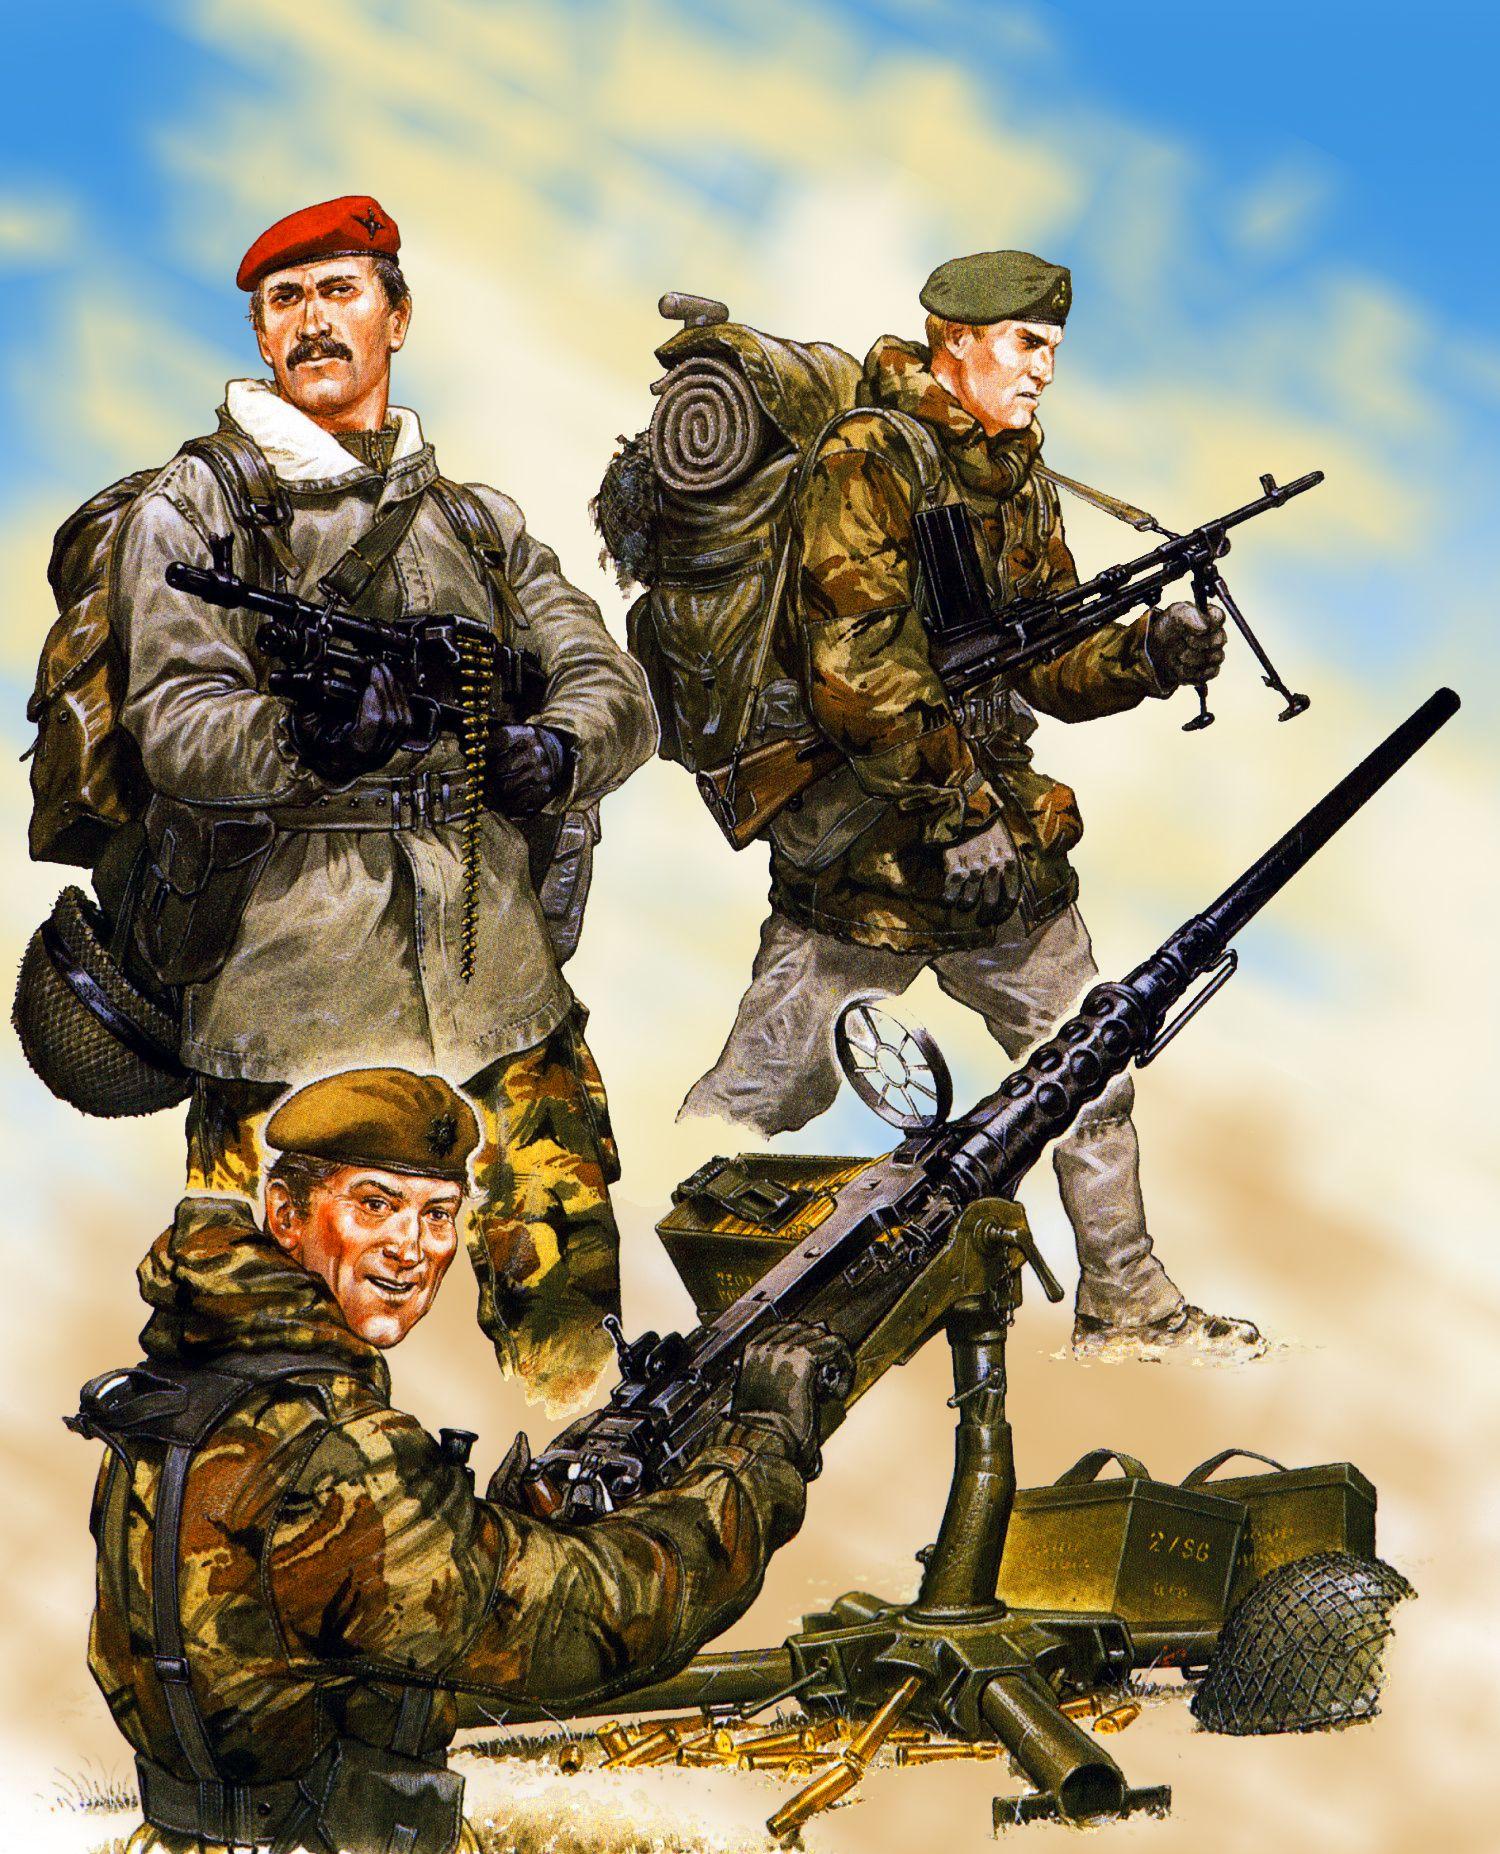 British Parachute Regiment and SAS Commando during the Falklands War